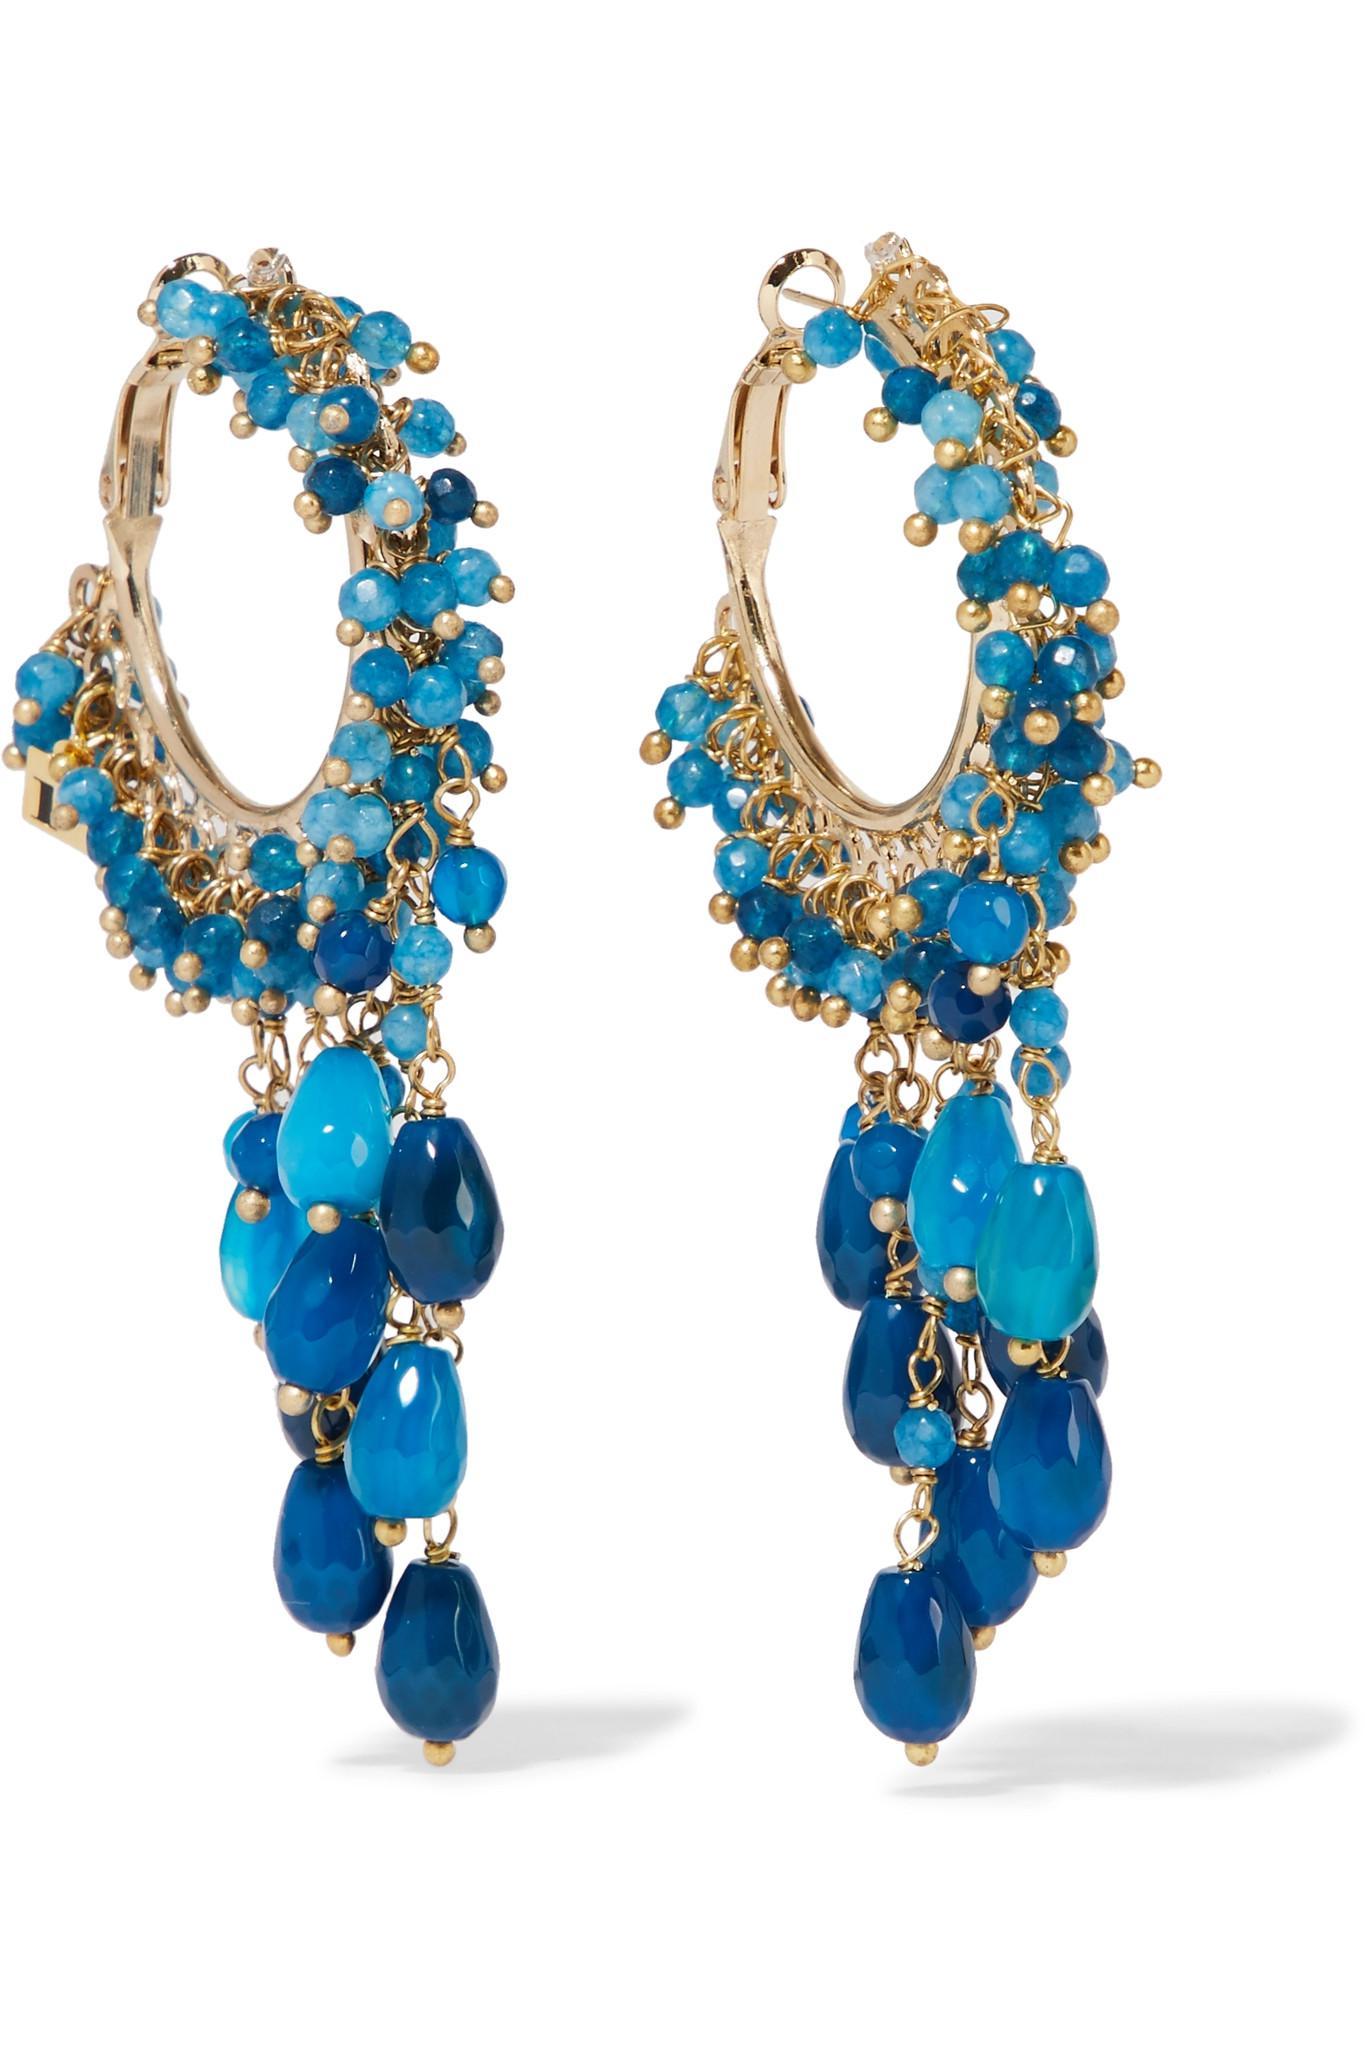 Vita Gold-tone Stone Clip Earrings - Blue Rosantica yTSl0klab